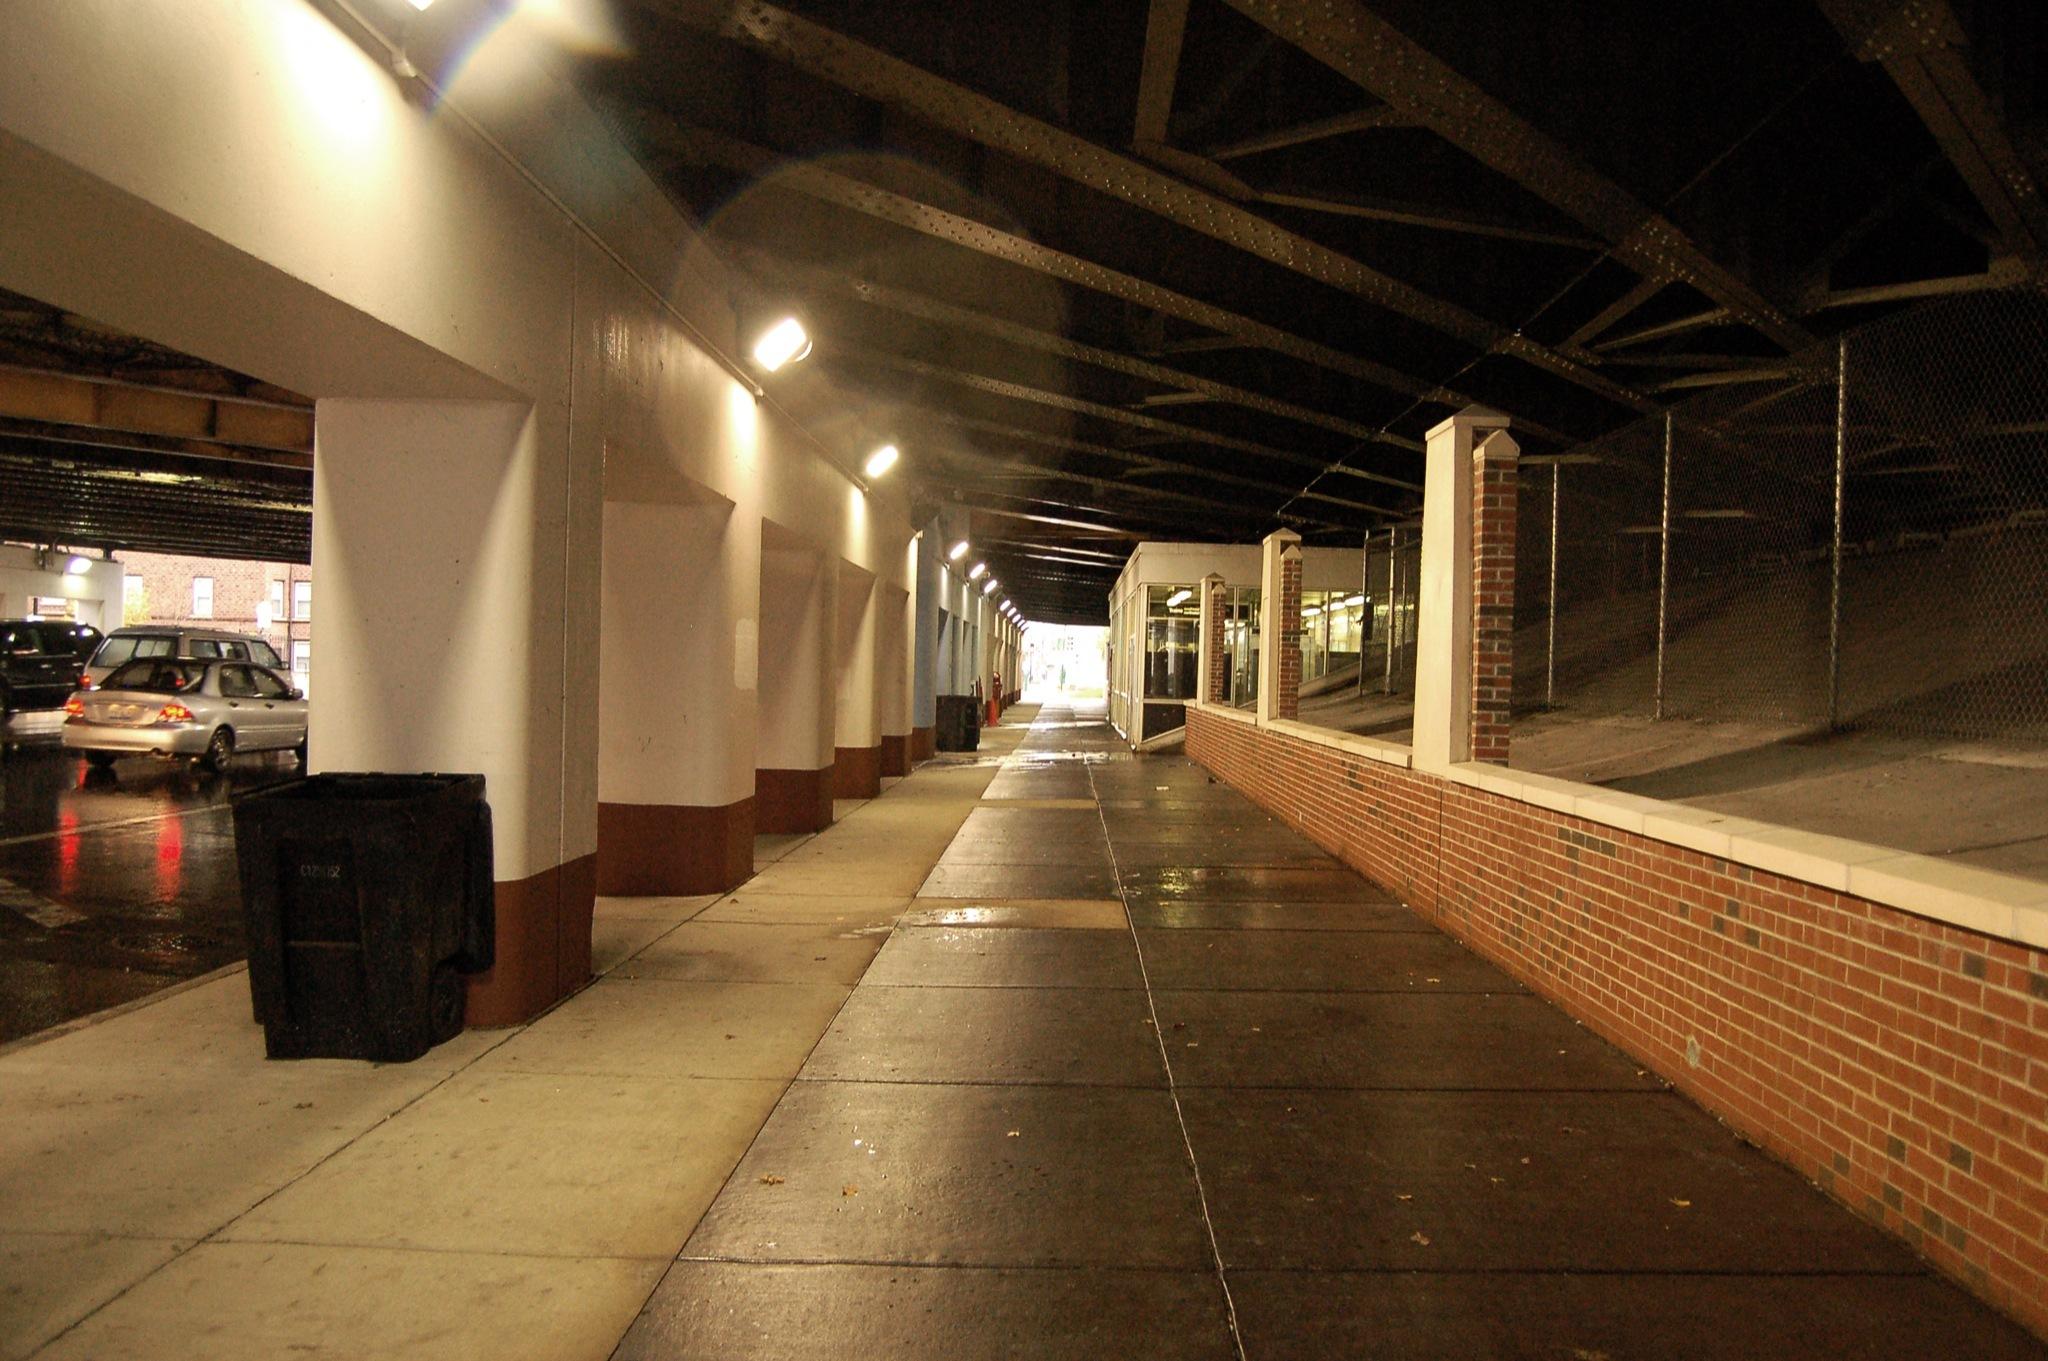 Irving Park Blue Line